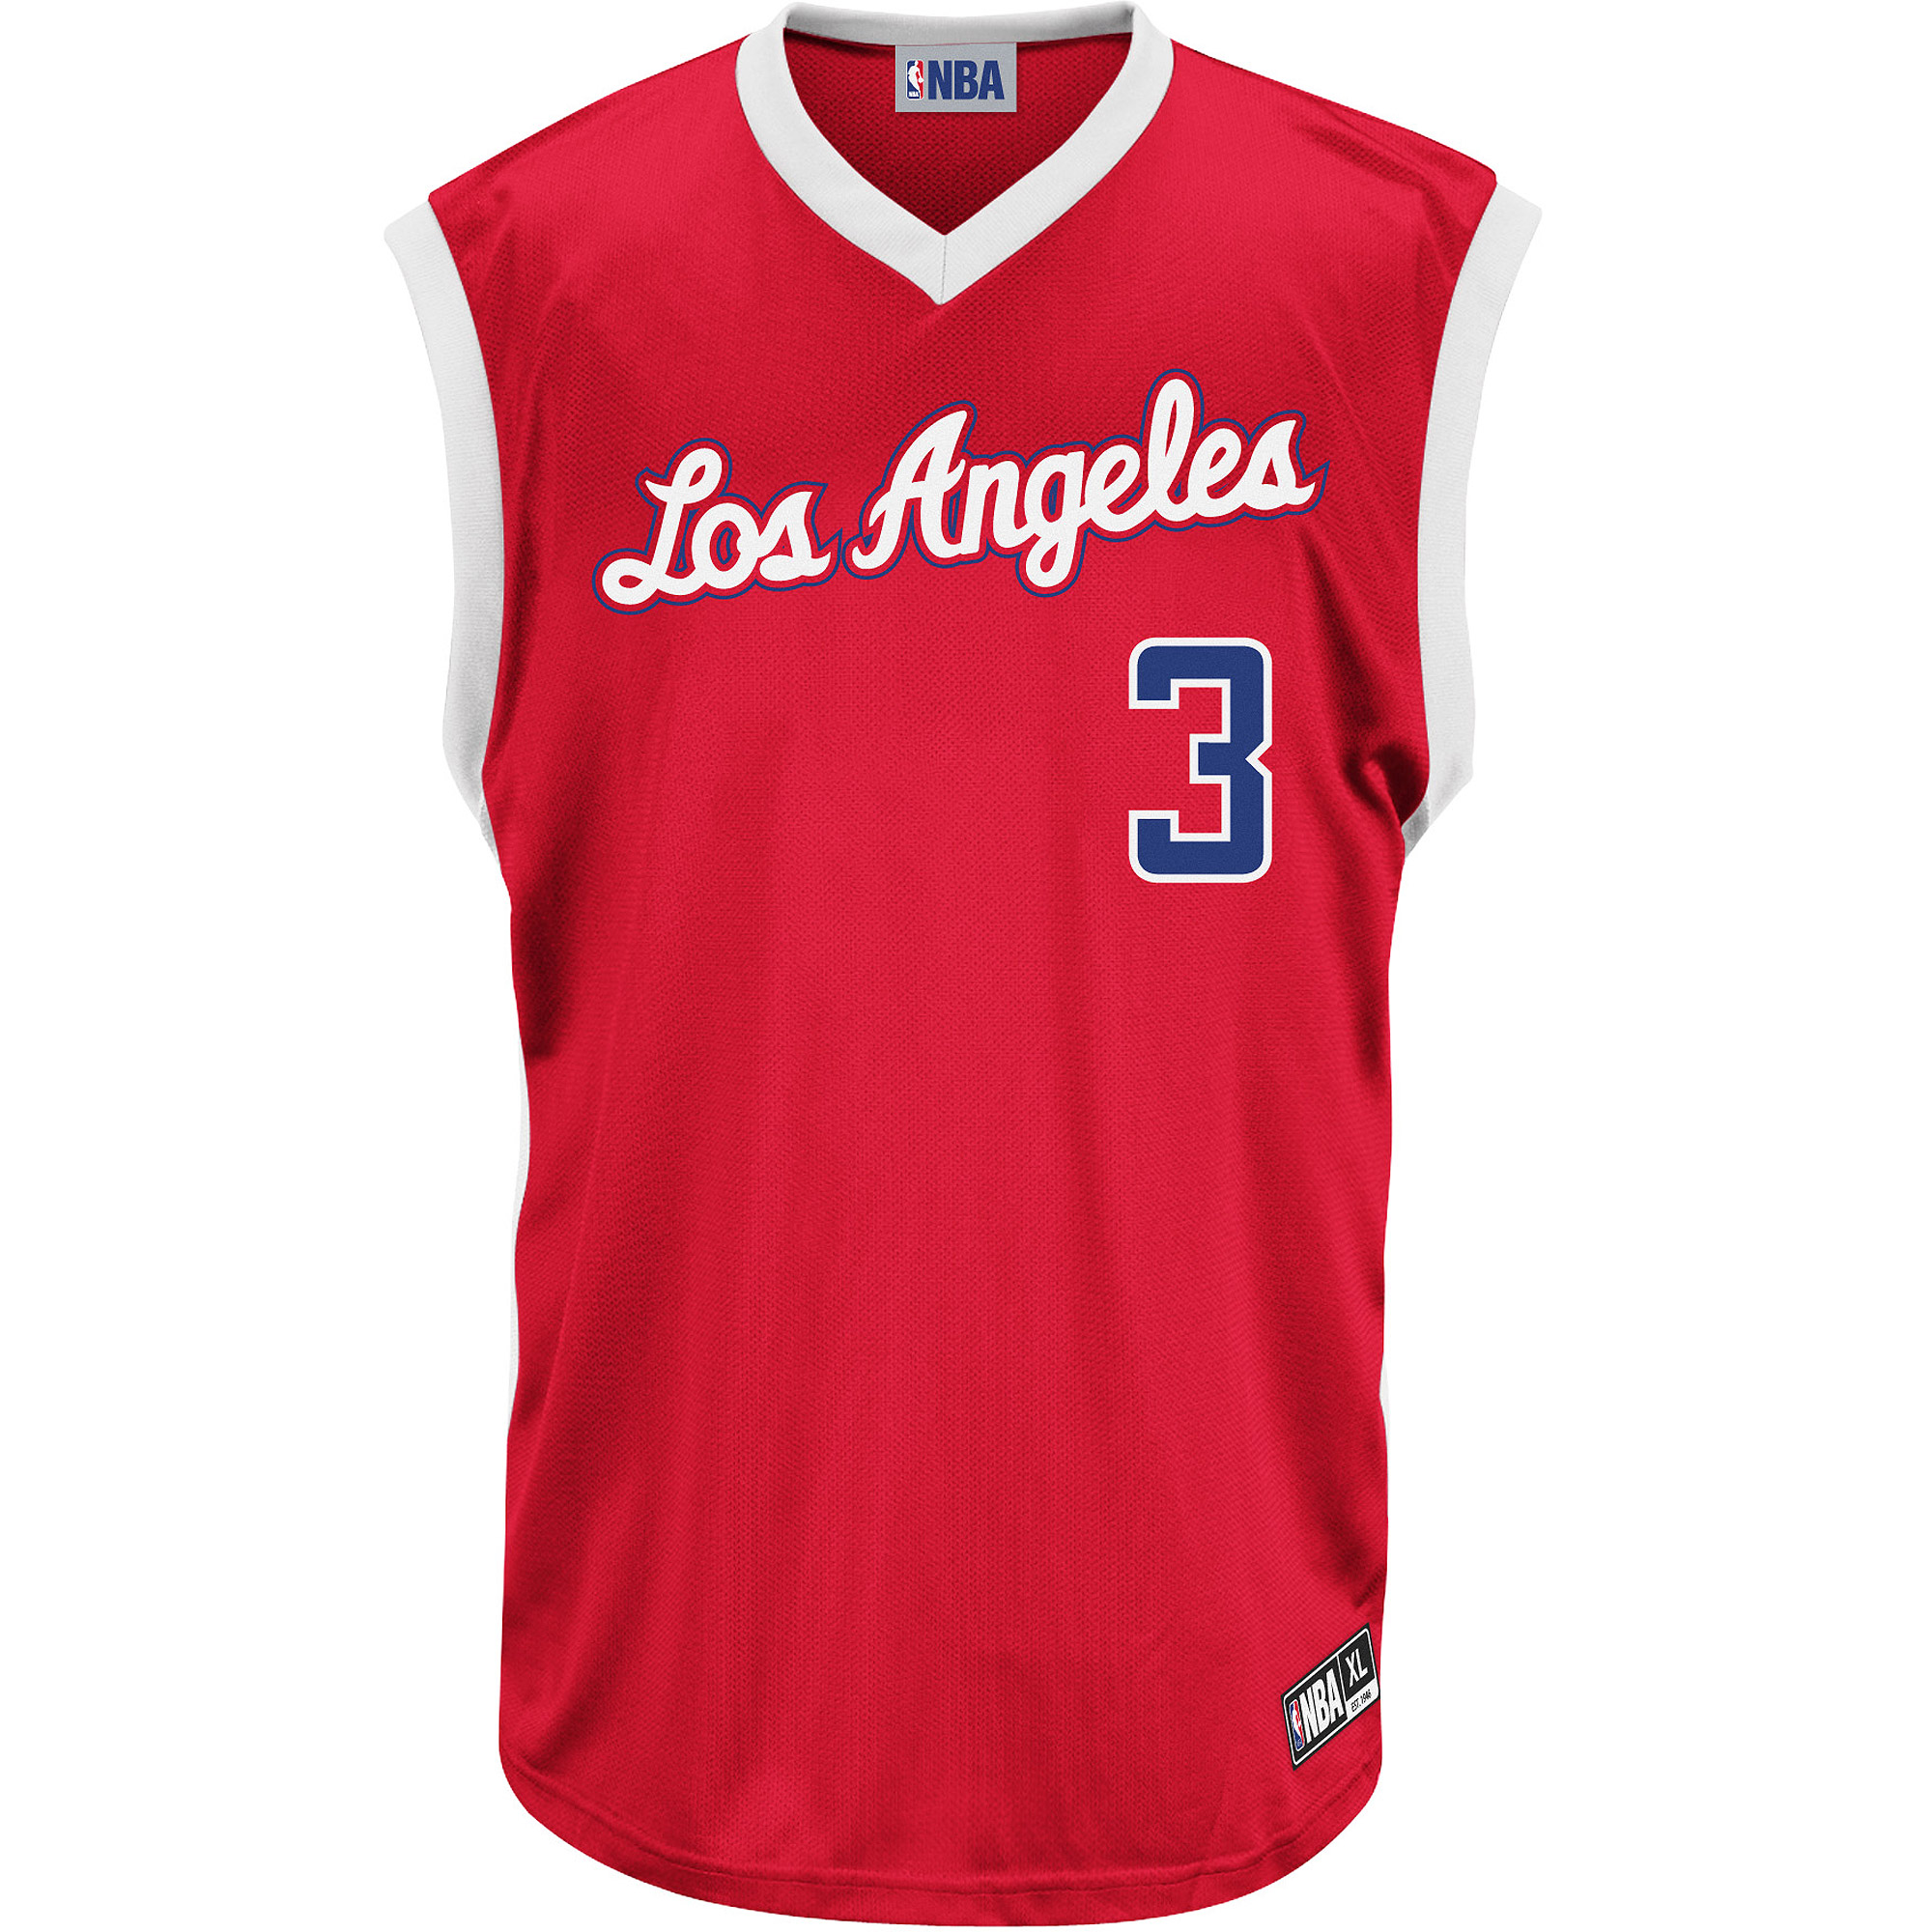 NBA Men's Chris Paul #3 Jersey